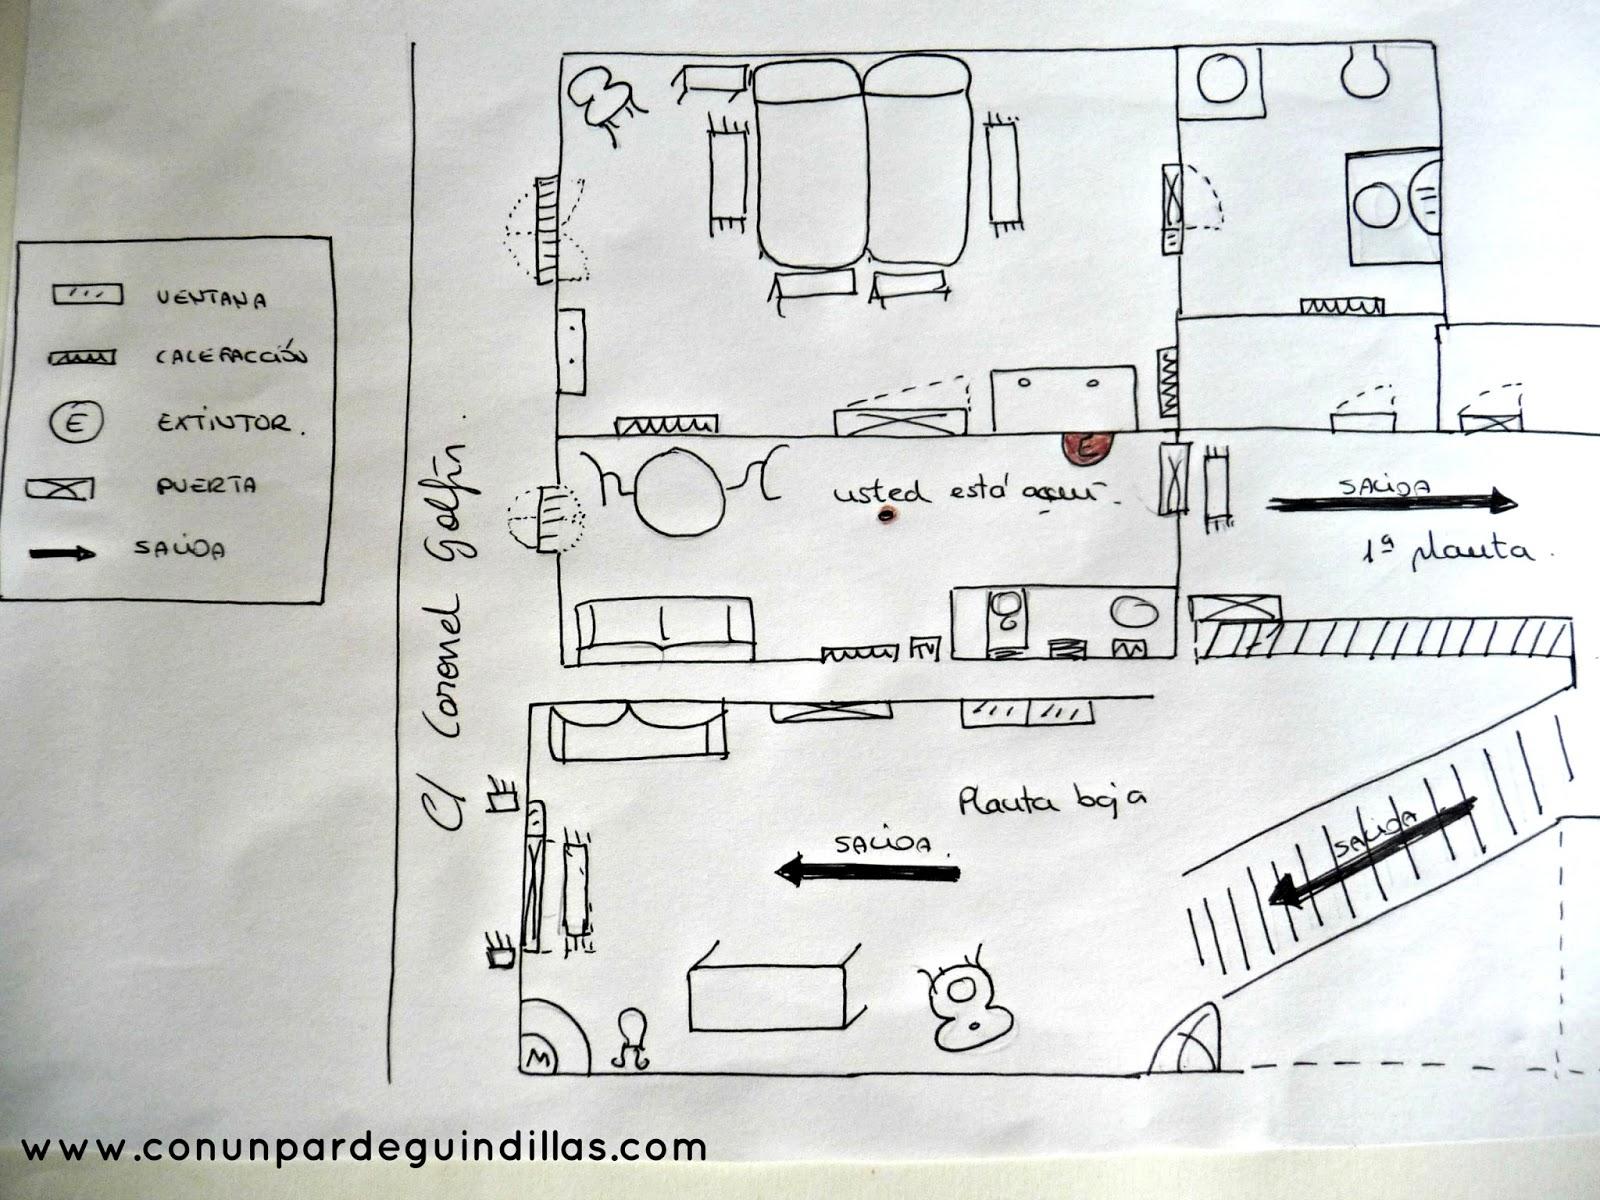 Programas representar planos elantro - Hacer plano de mi casa ...